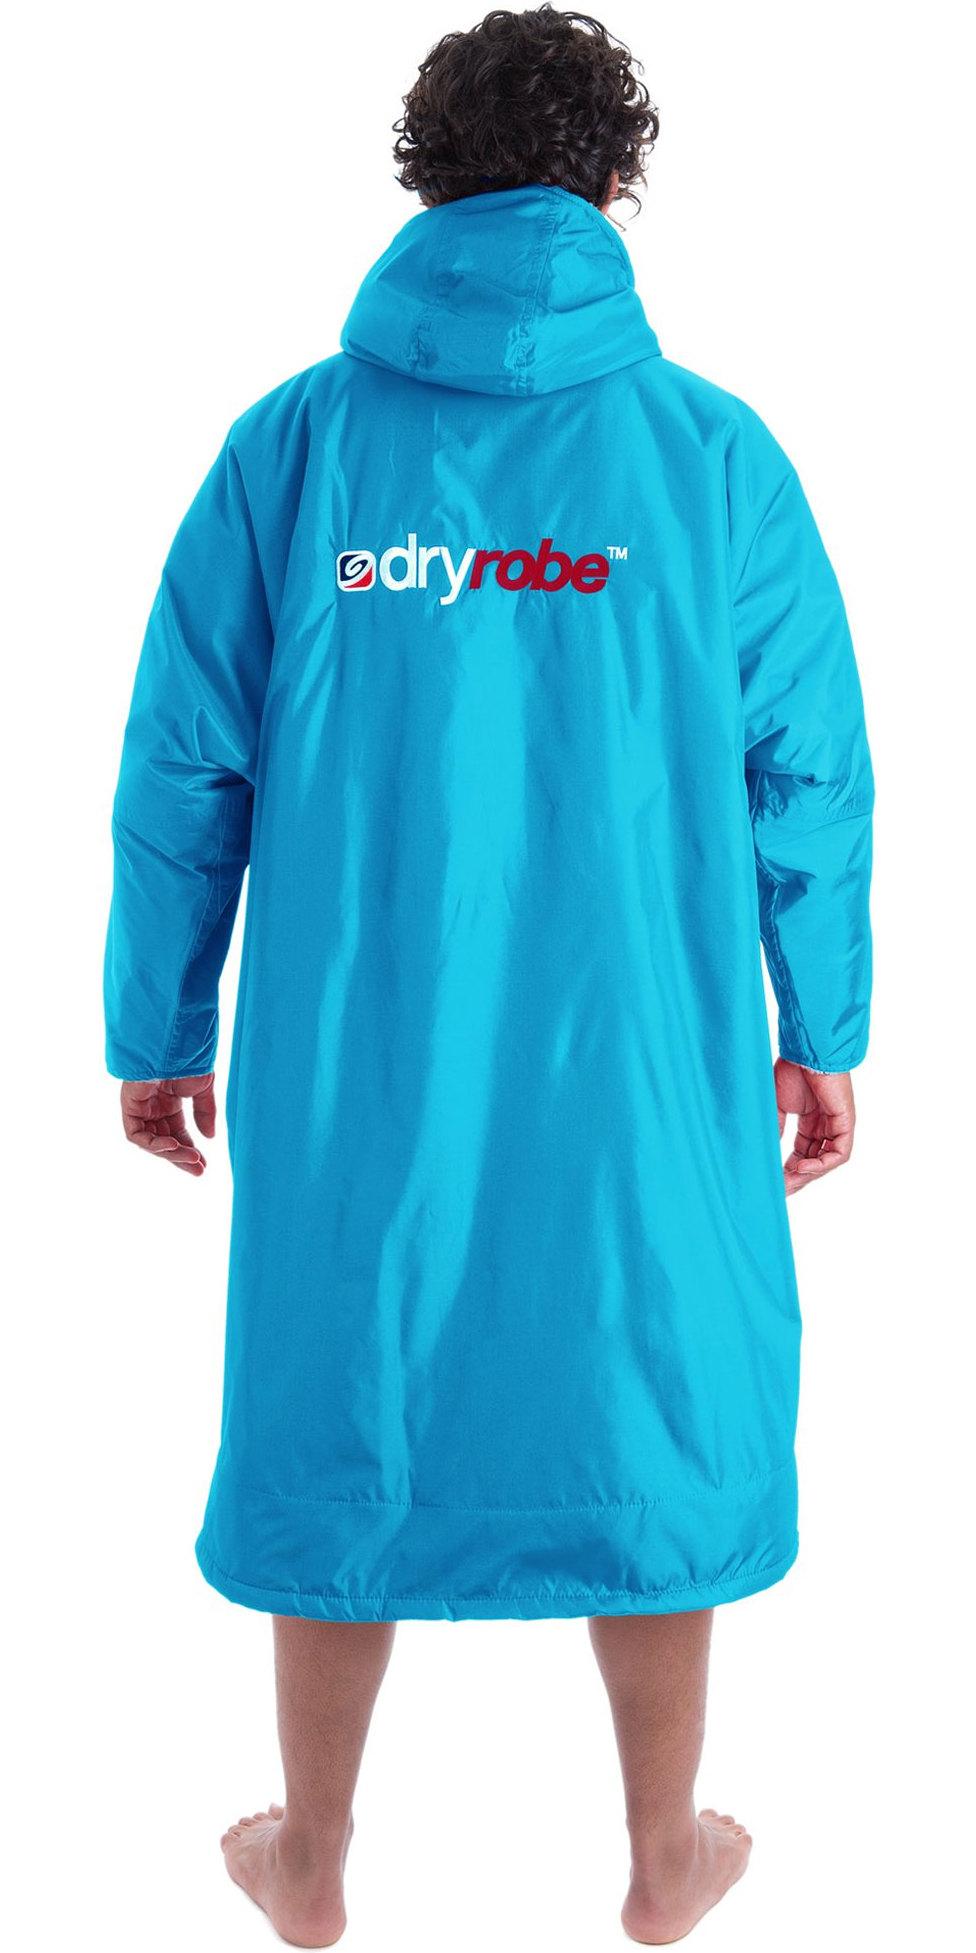 2019 Dryrobe Advance Long Sleeve Premium Outdoor Change Robe / Poncho DR104 SKY / GREY